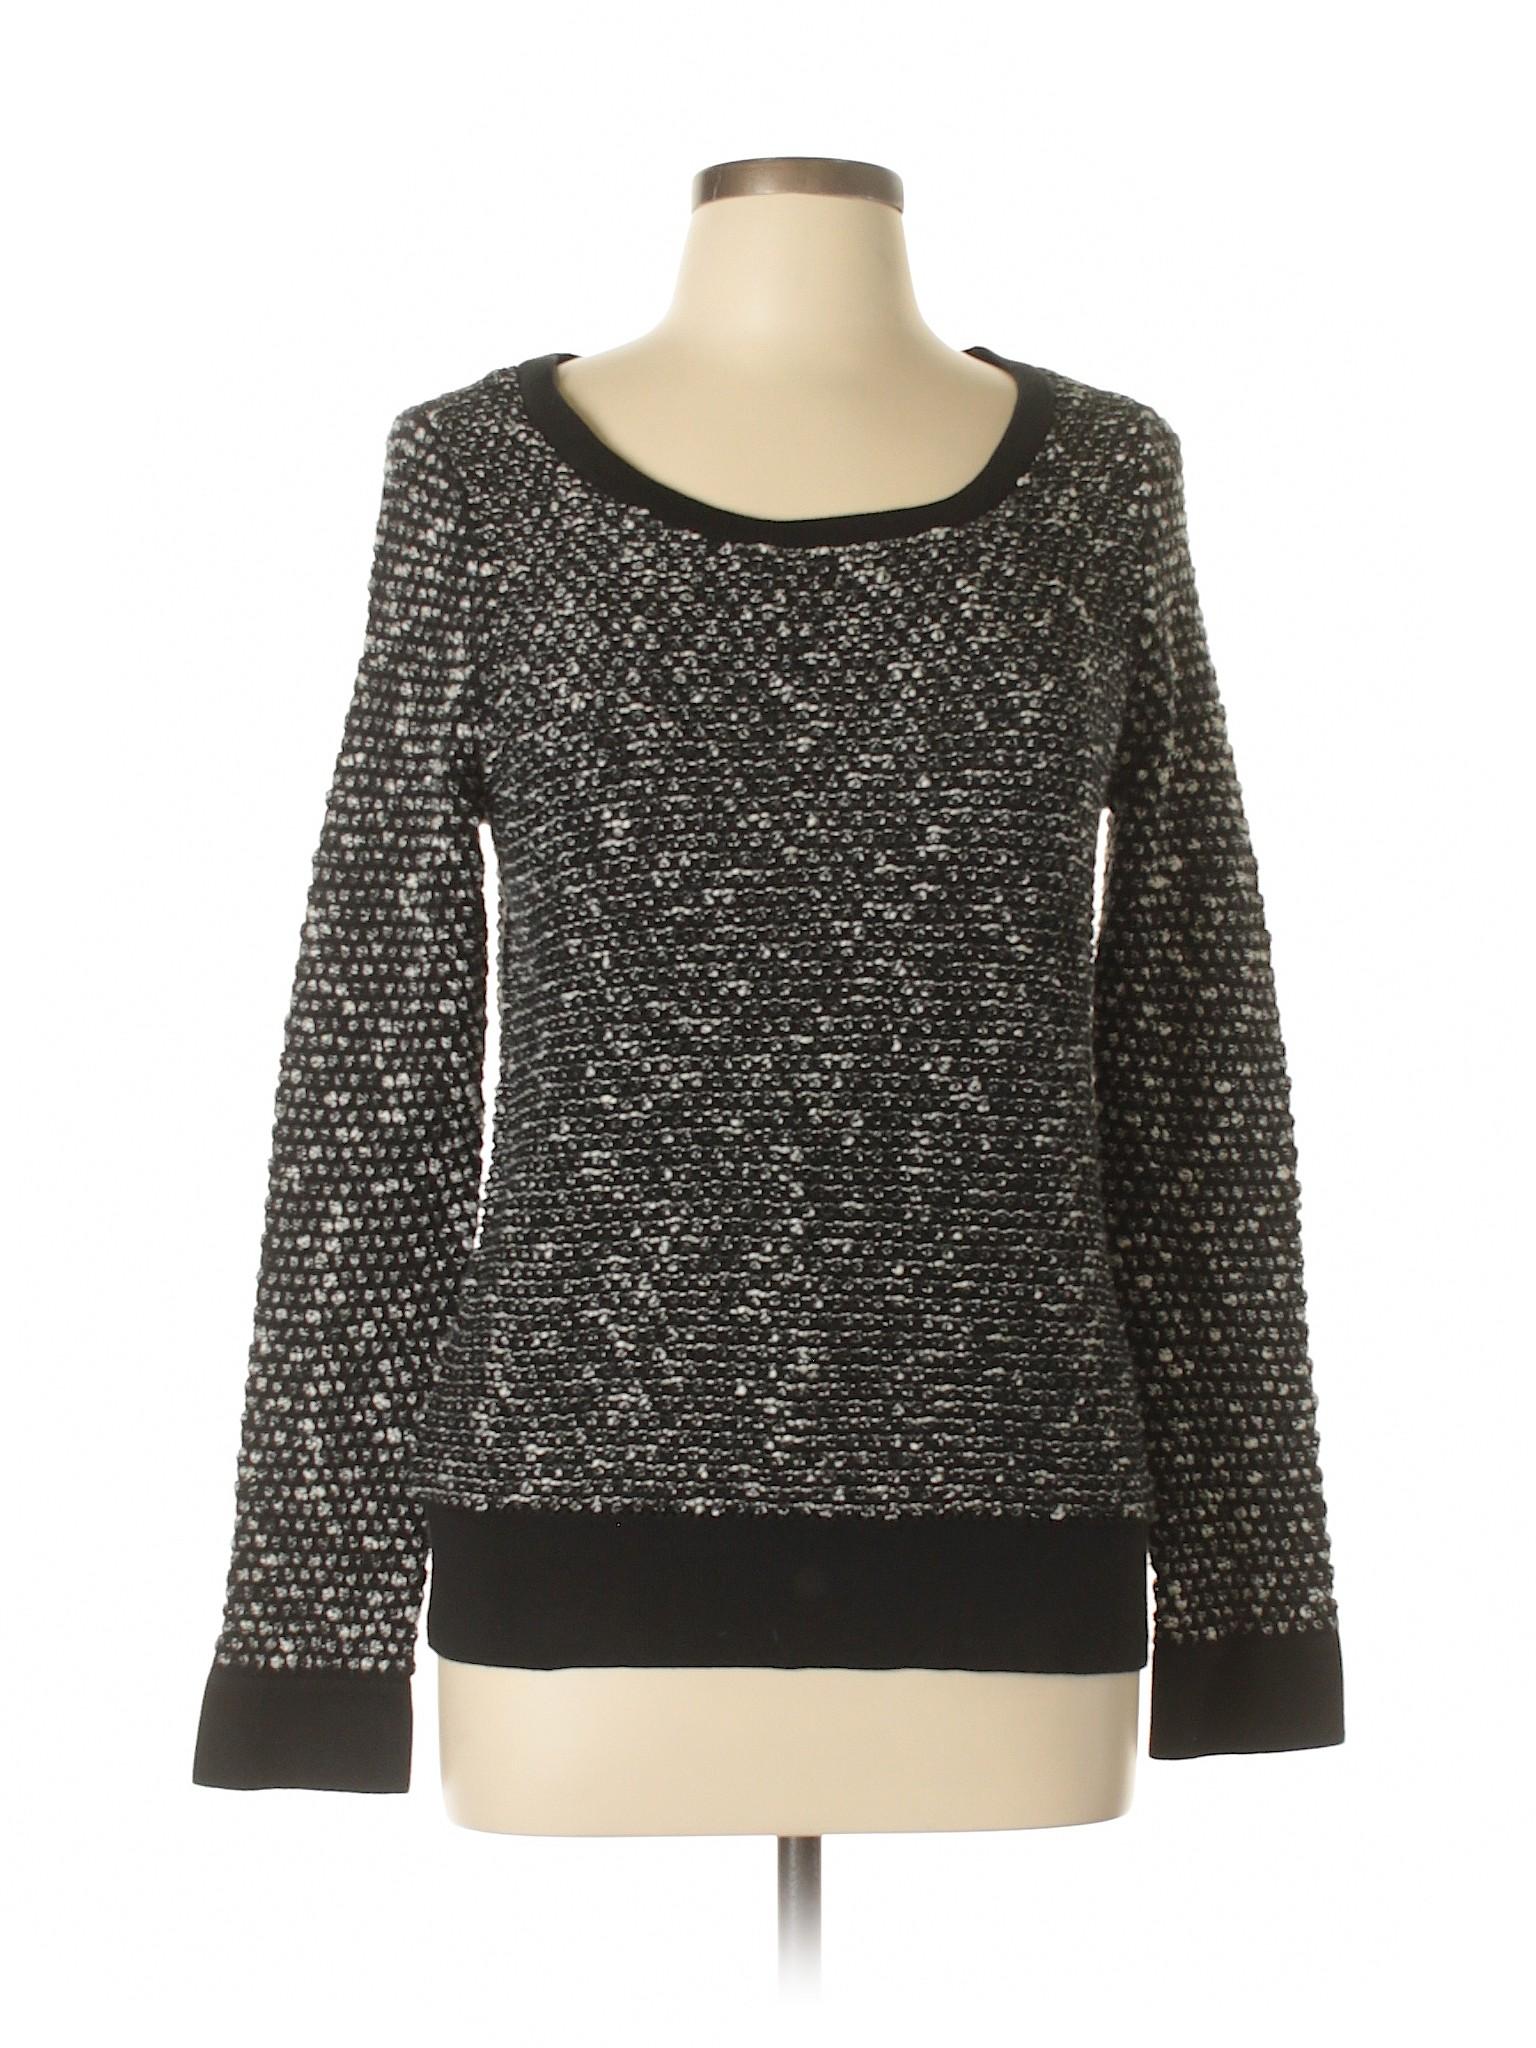 Pullover Taylor Ann Boutique winter Sweater LOFT xwn7HC8qA